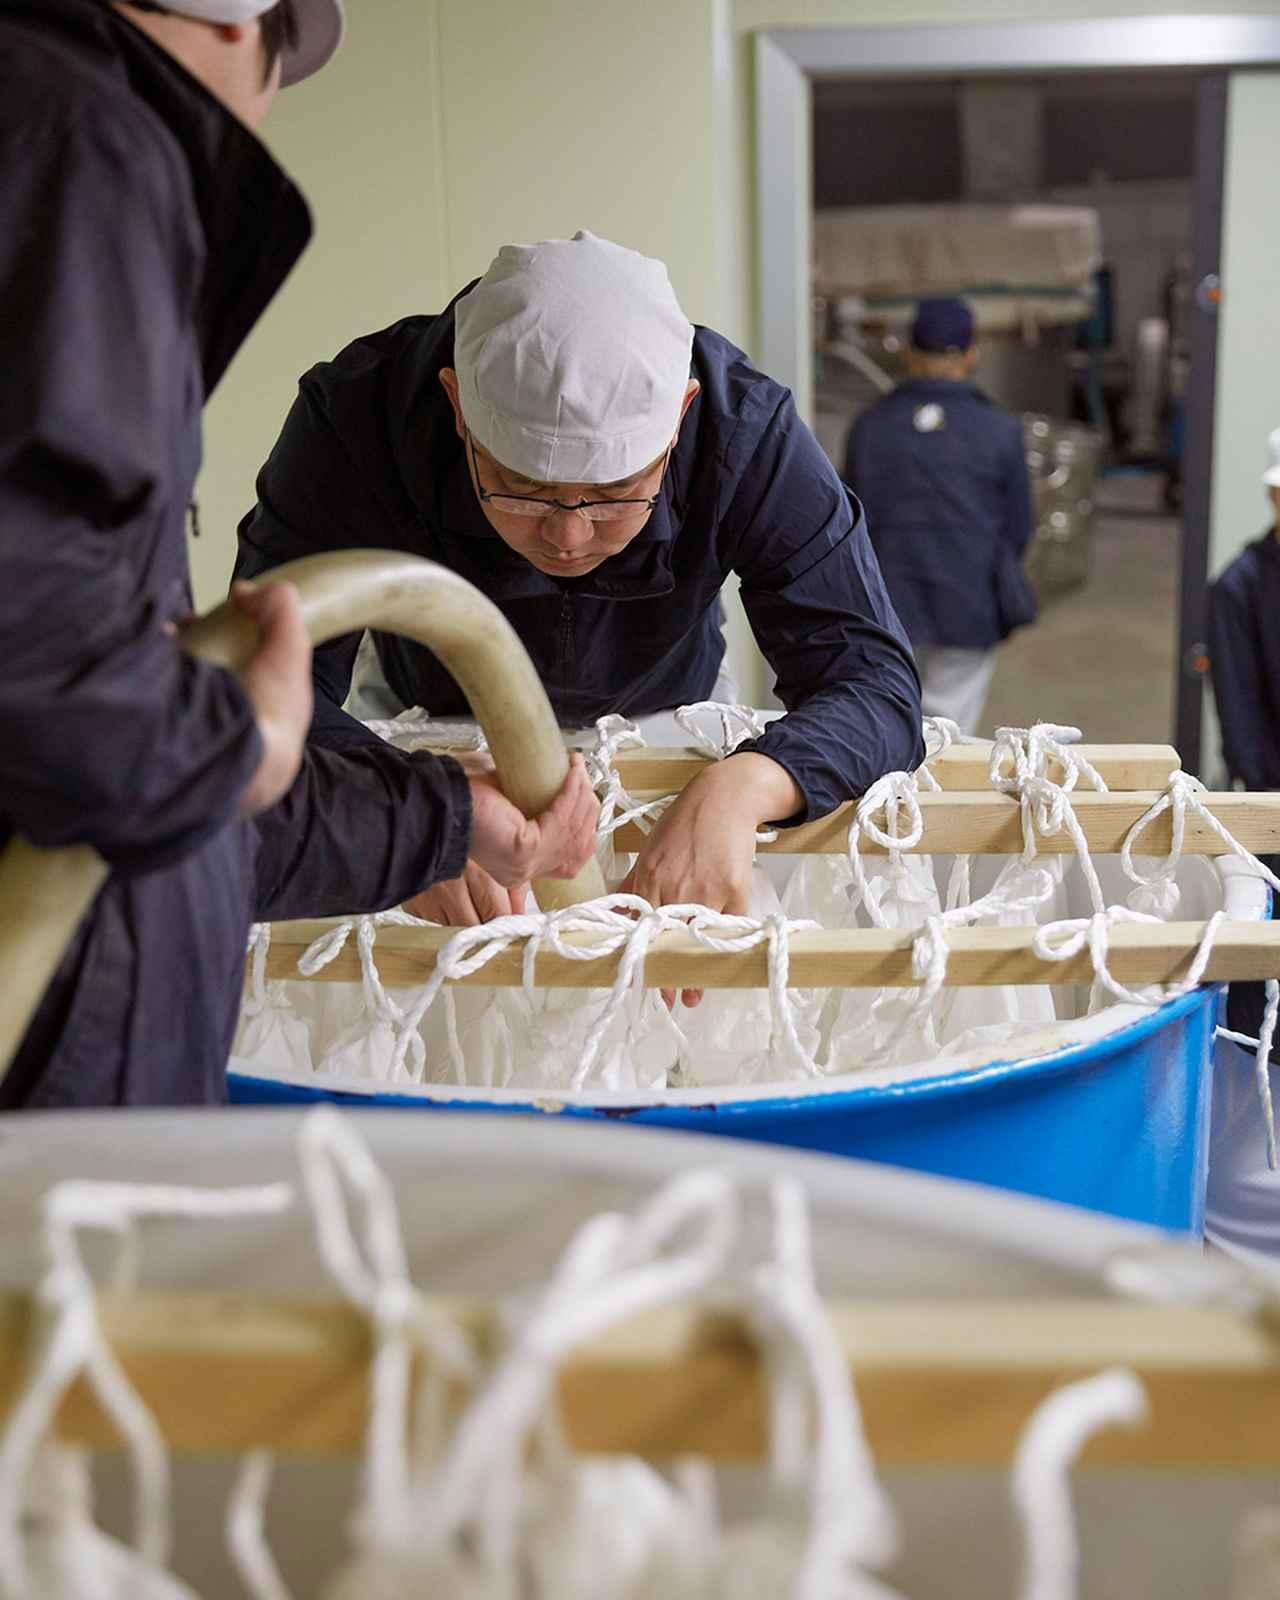 Images : 2番目の画像 - 「日本酒応援団を支える 酒蔵を訪ねて Vol.2 ~ 埼玉県上尾市「北西酒造」~」のアルバム - T JAPAN:The New York Times Style Magazine 公式サイト